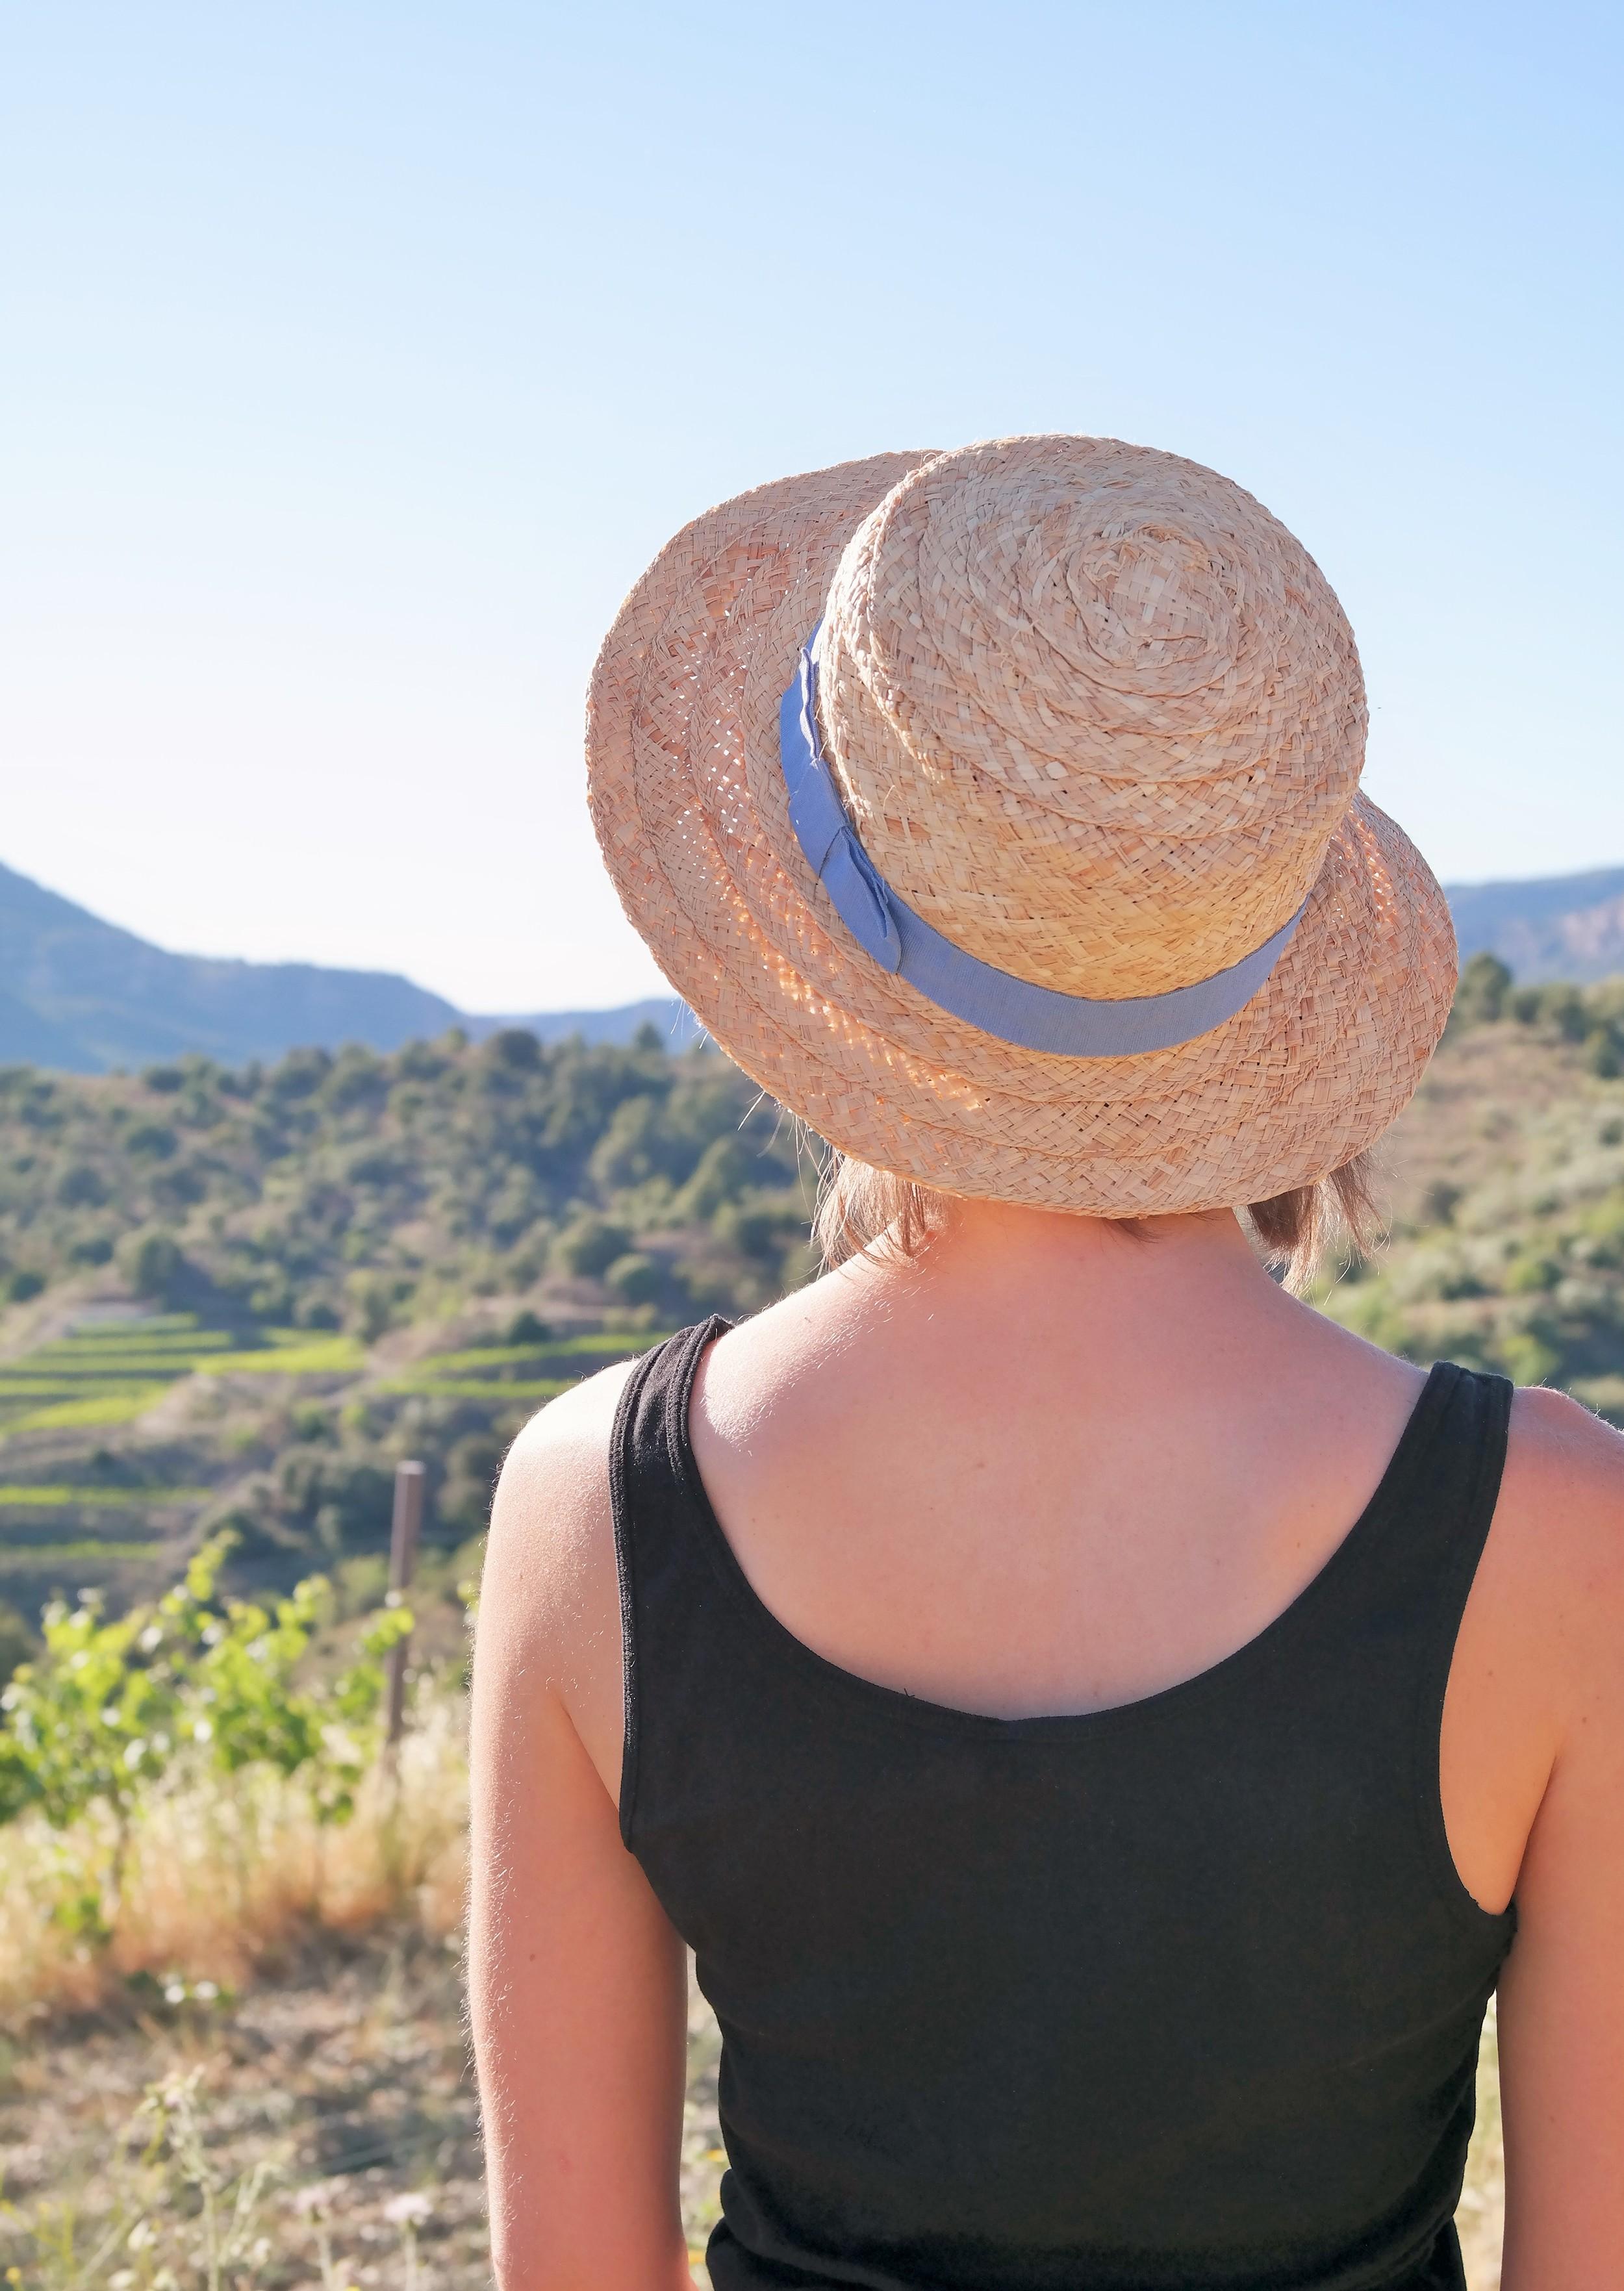 Spansk sombrero i Penedès, Spanien. Foto: Carin Rosell